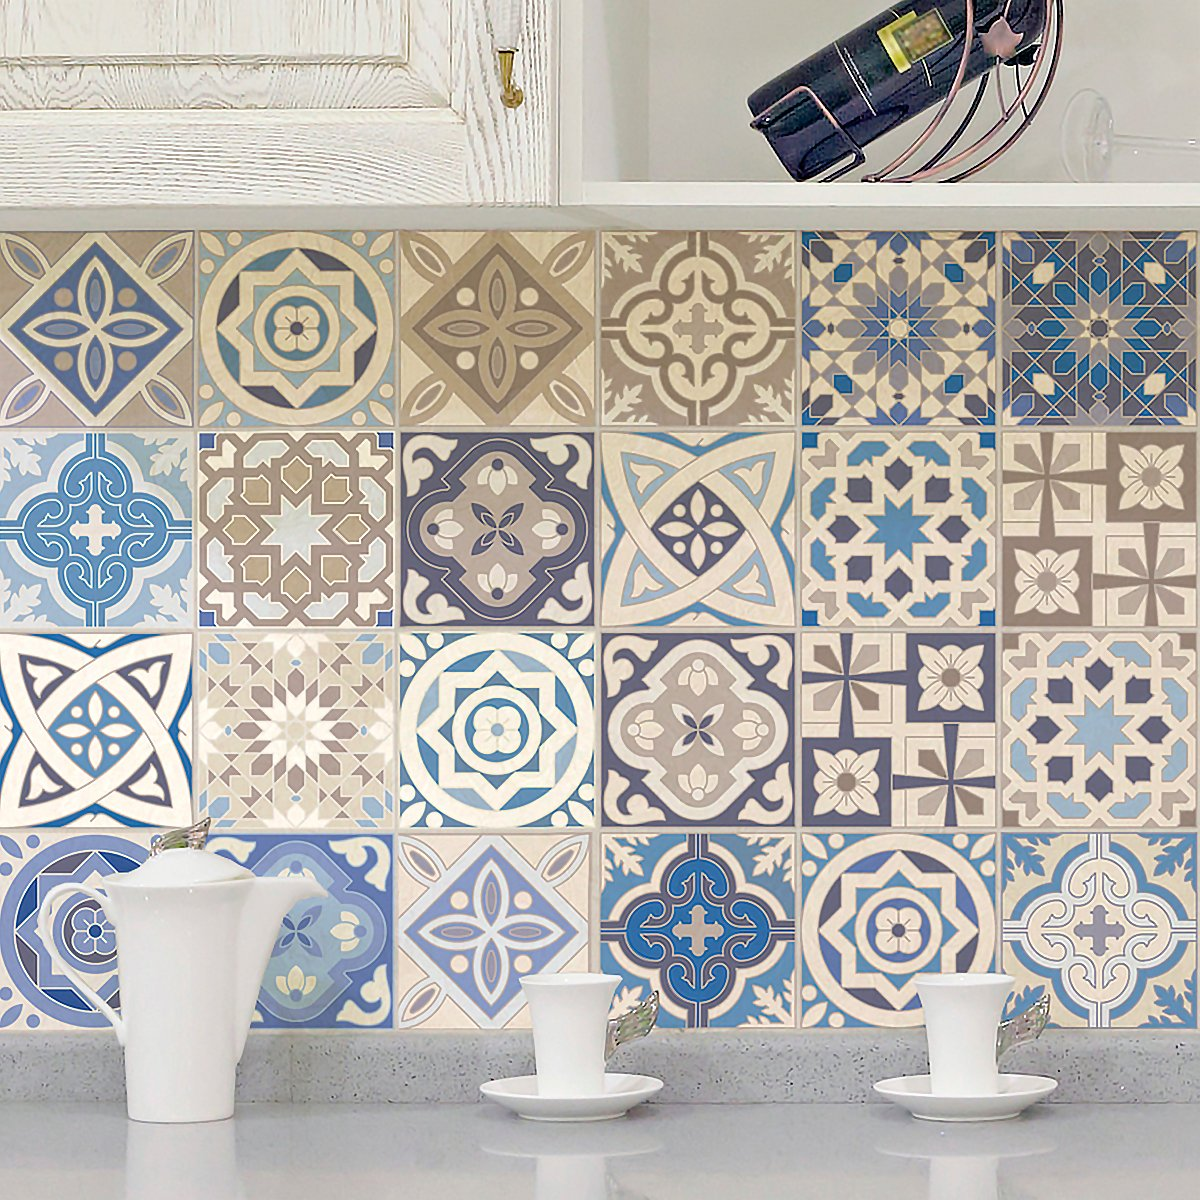 24 pi/èces Stickers adh/ésifs carrelages muraux azulejos 20 x 20 cm